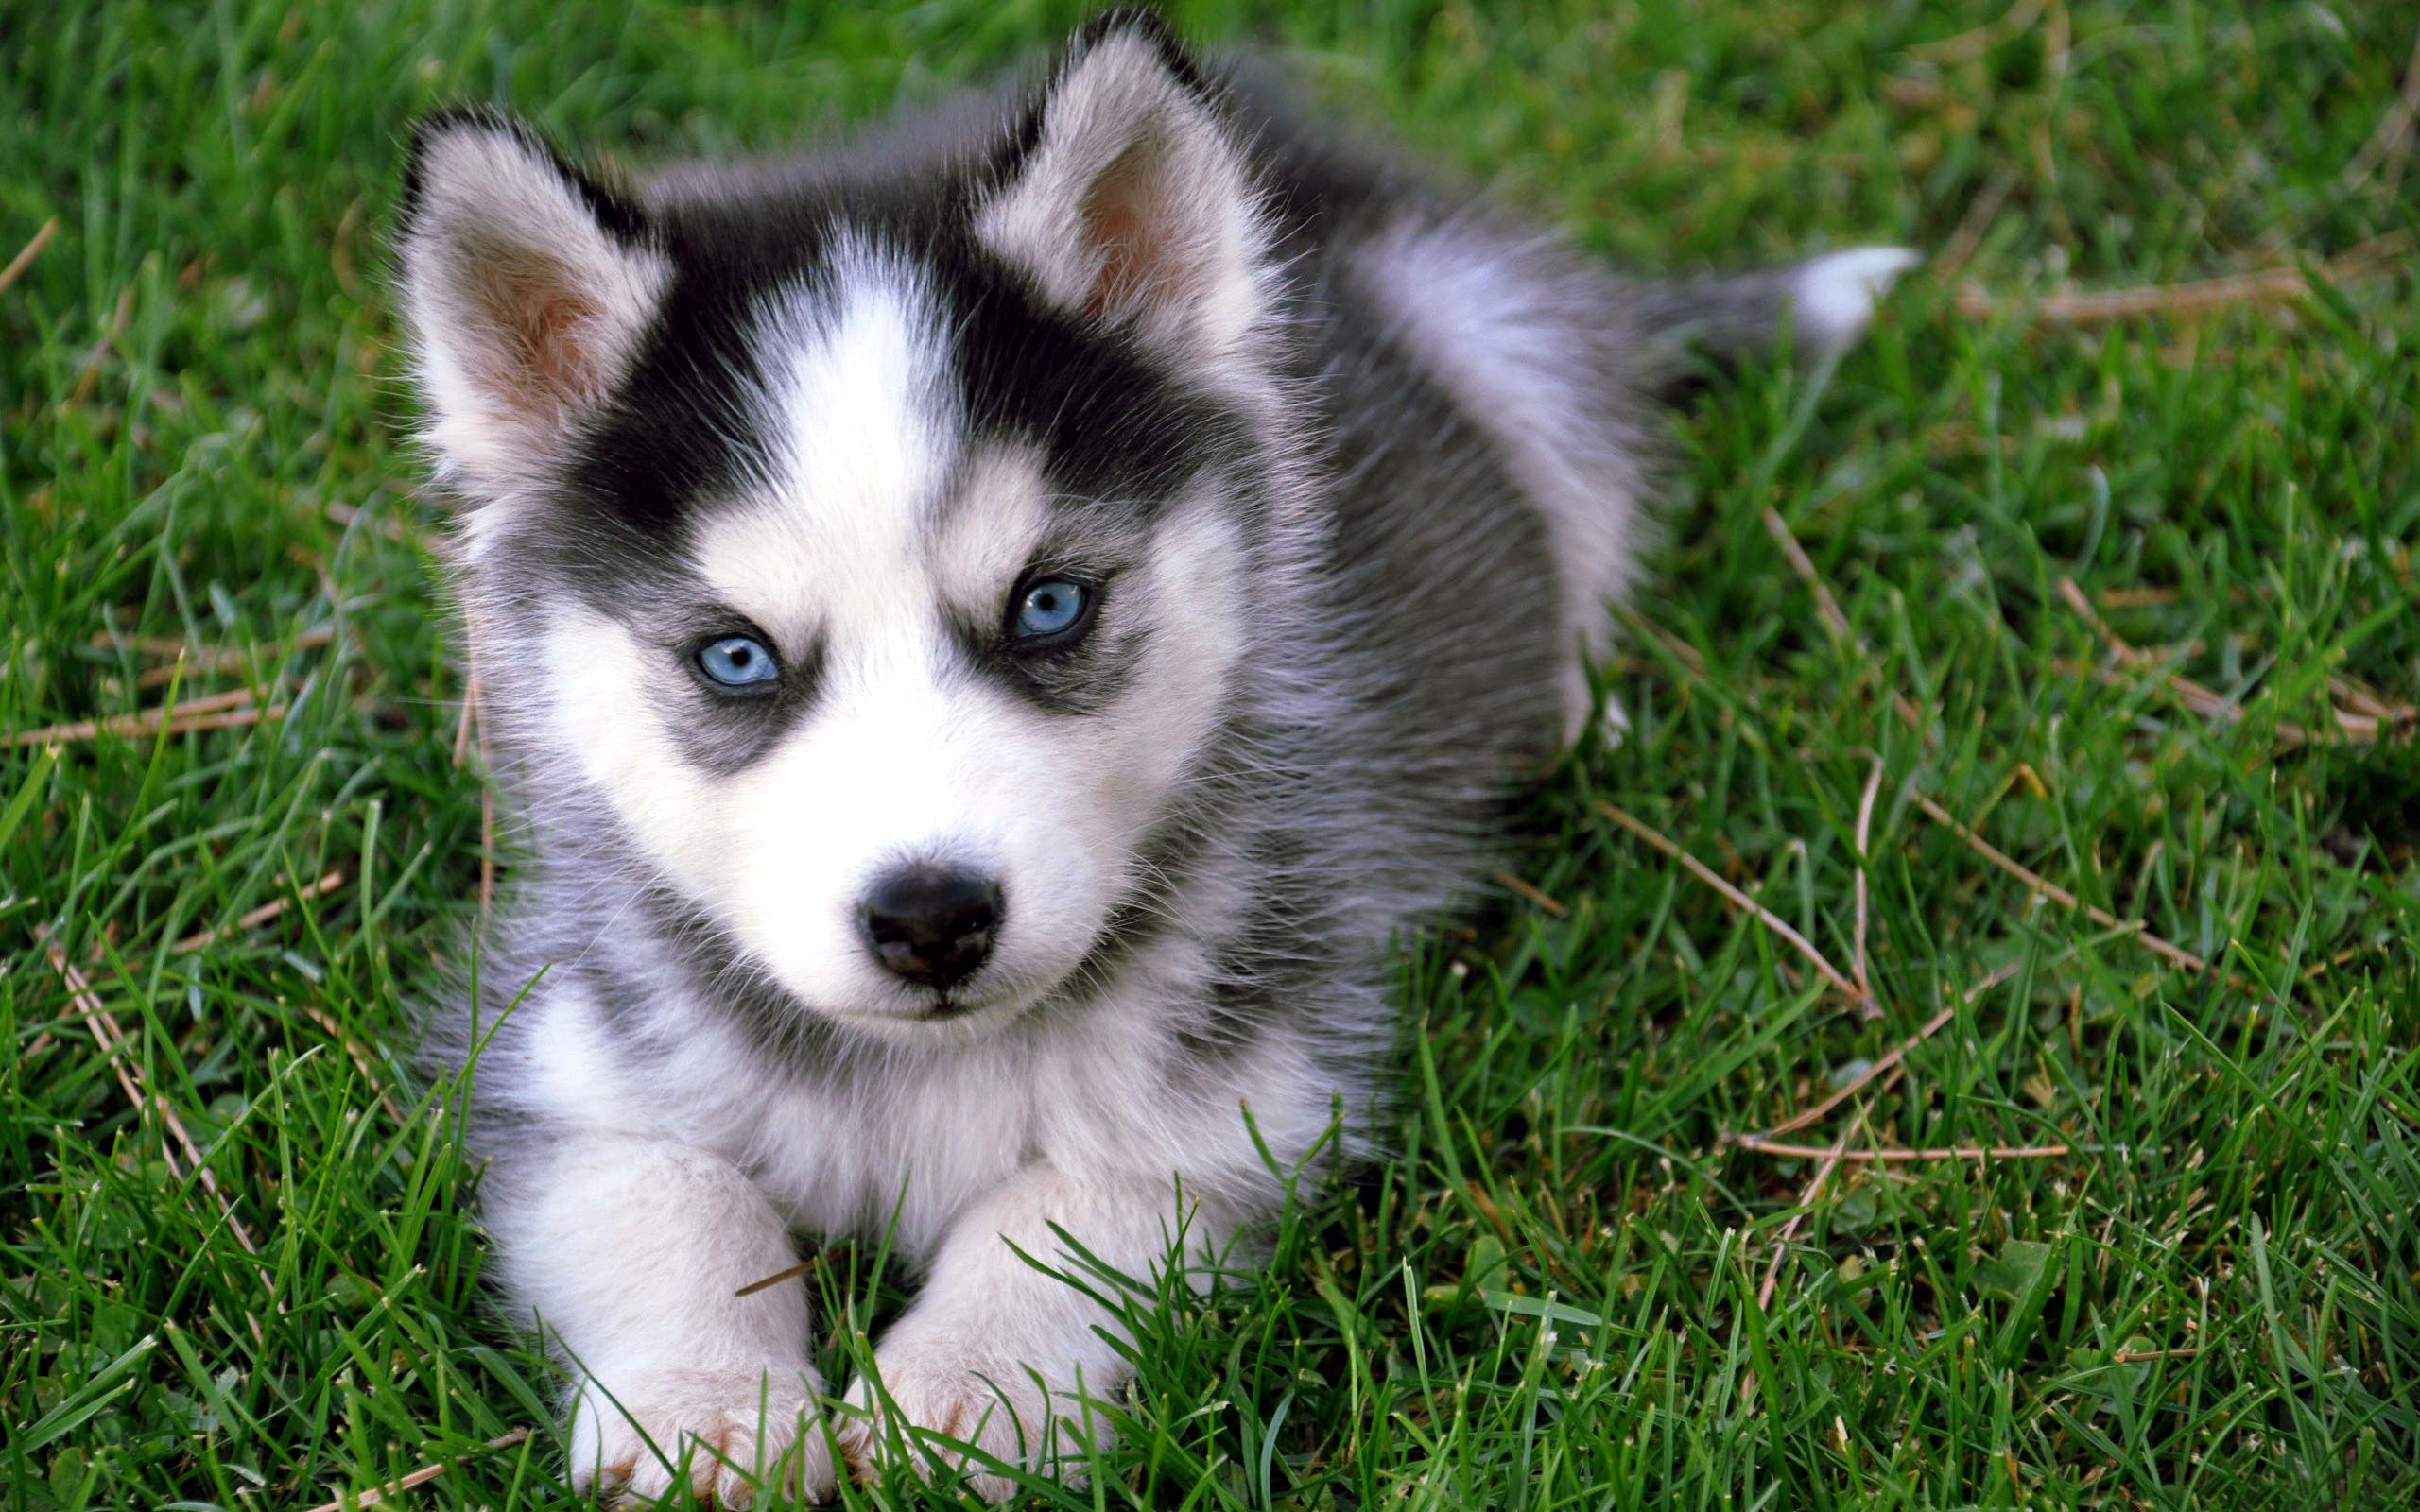 Husky Puppy Blue Eyes Hd Wallpaper Cute Husky Puppies Cute